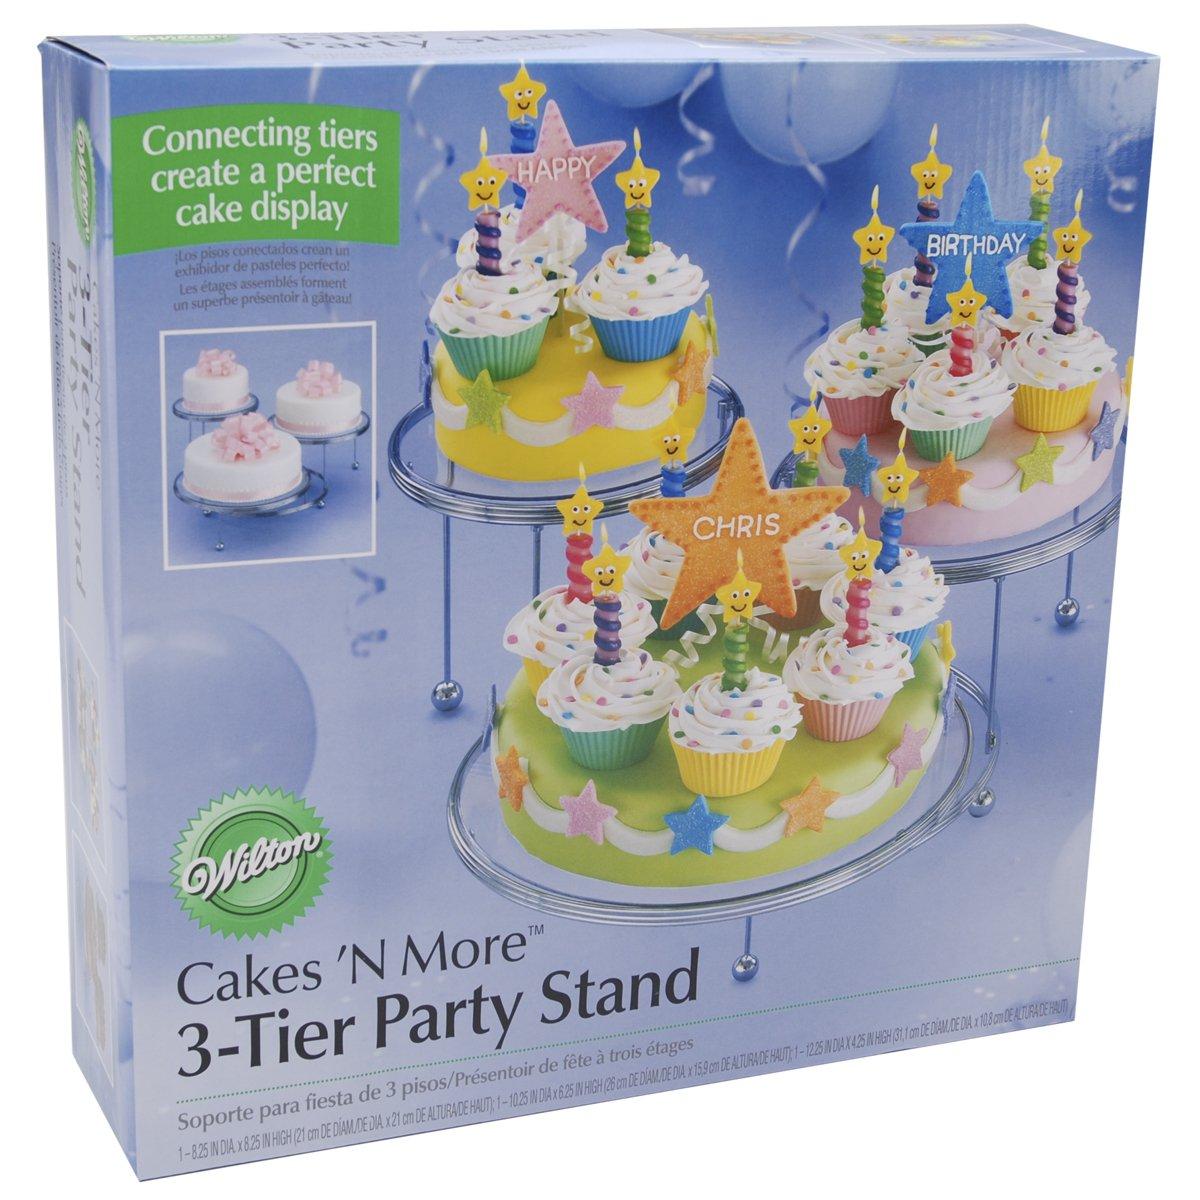 Wilton Cakes 'N More 3-Tier Cake Stand, Chrome